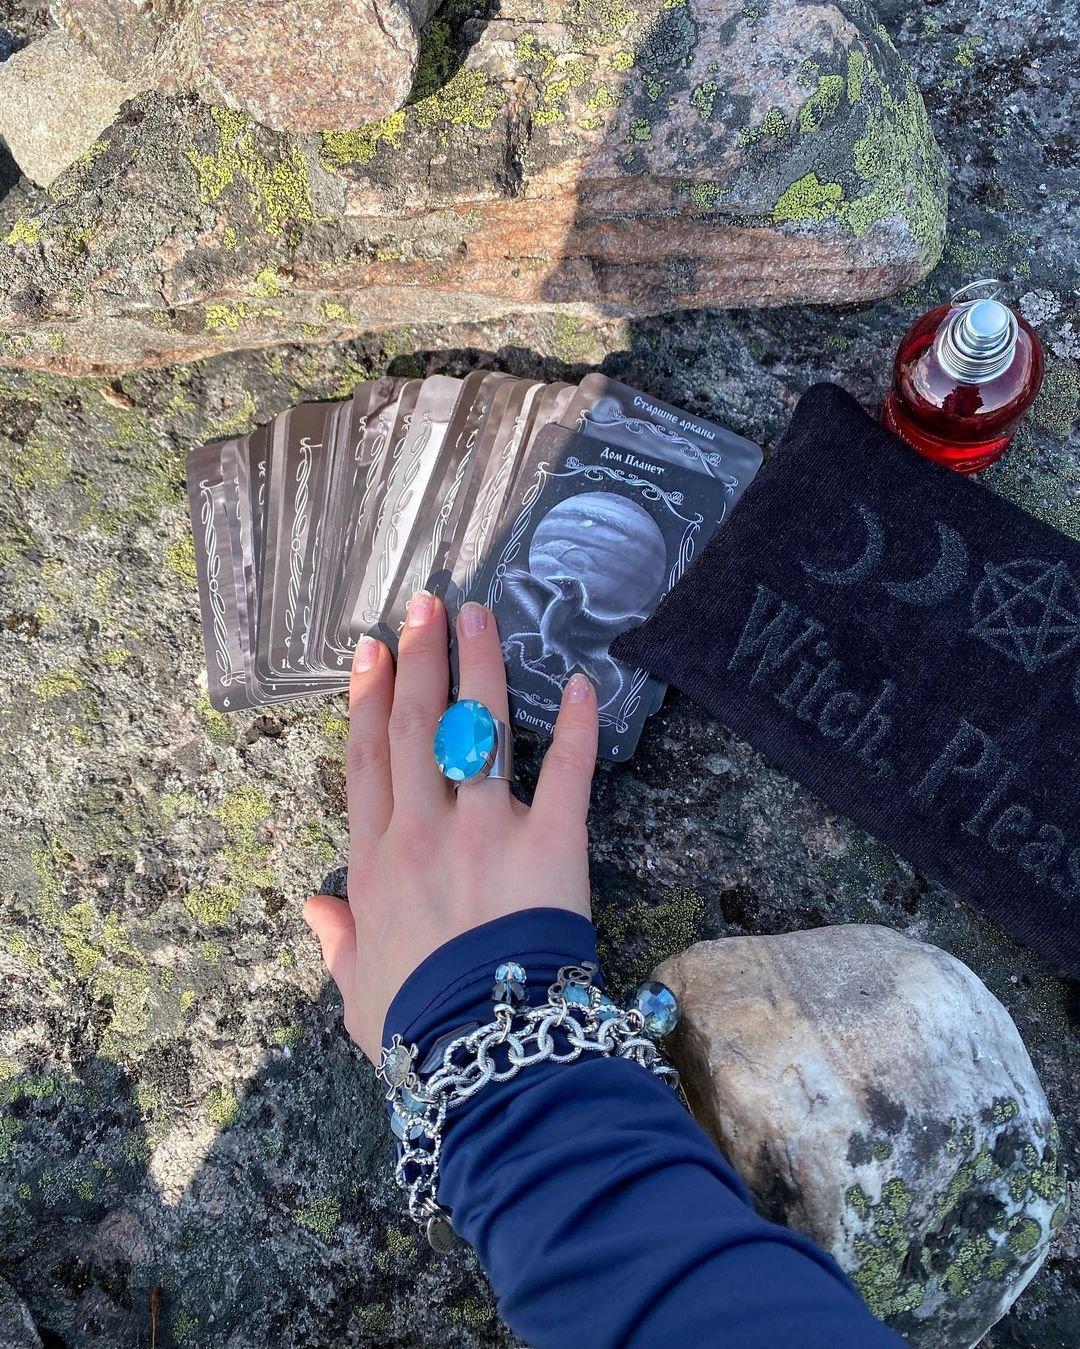 Алёна Водонаева отправилась на прогулку по горам Карелии в нелепой шляпке и костюме